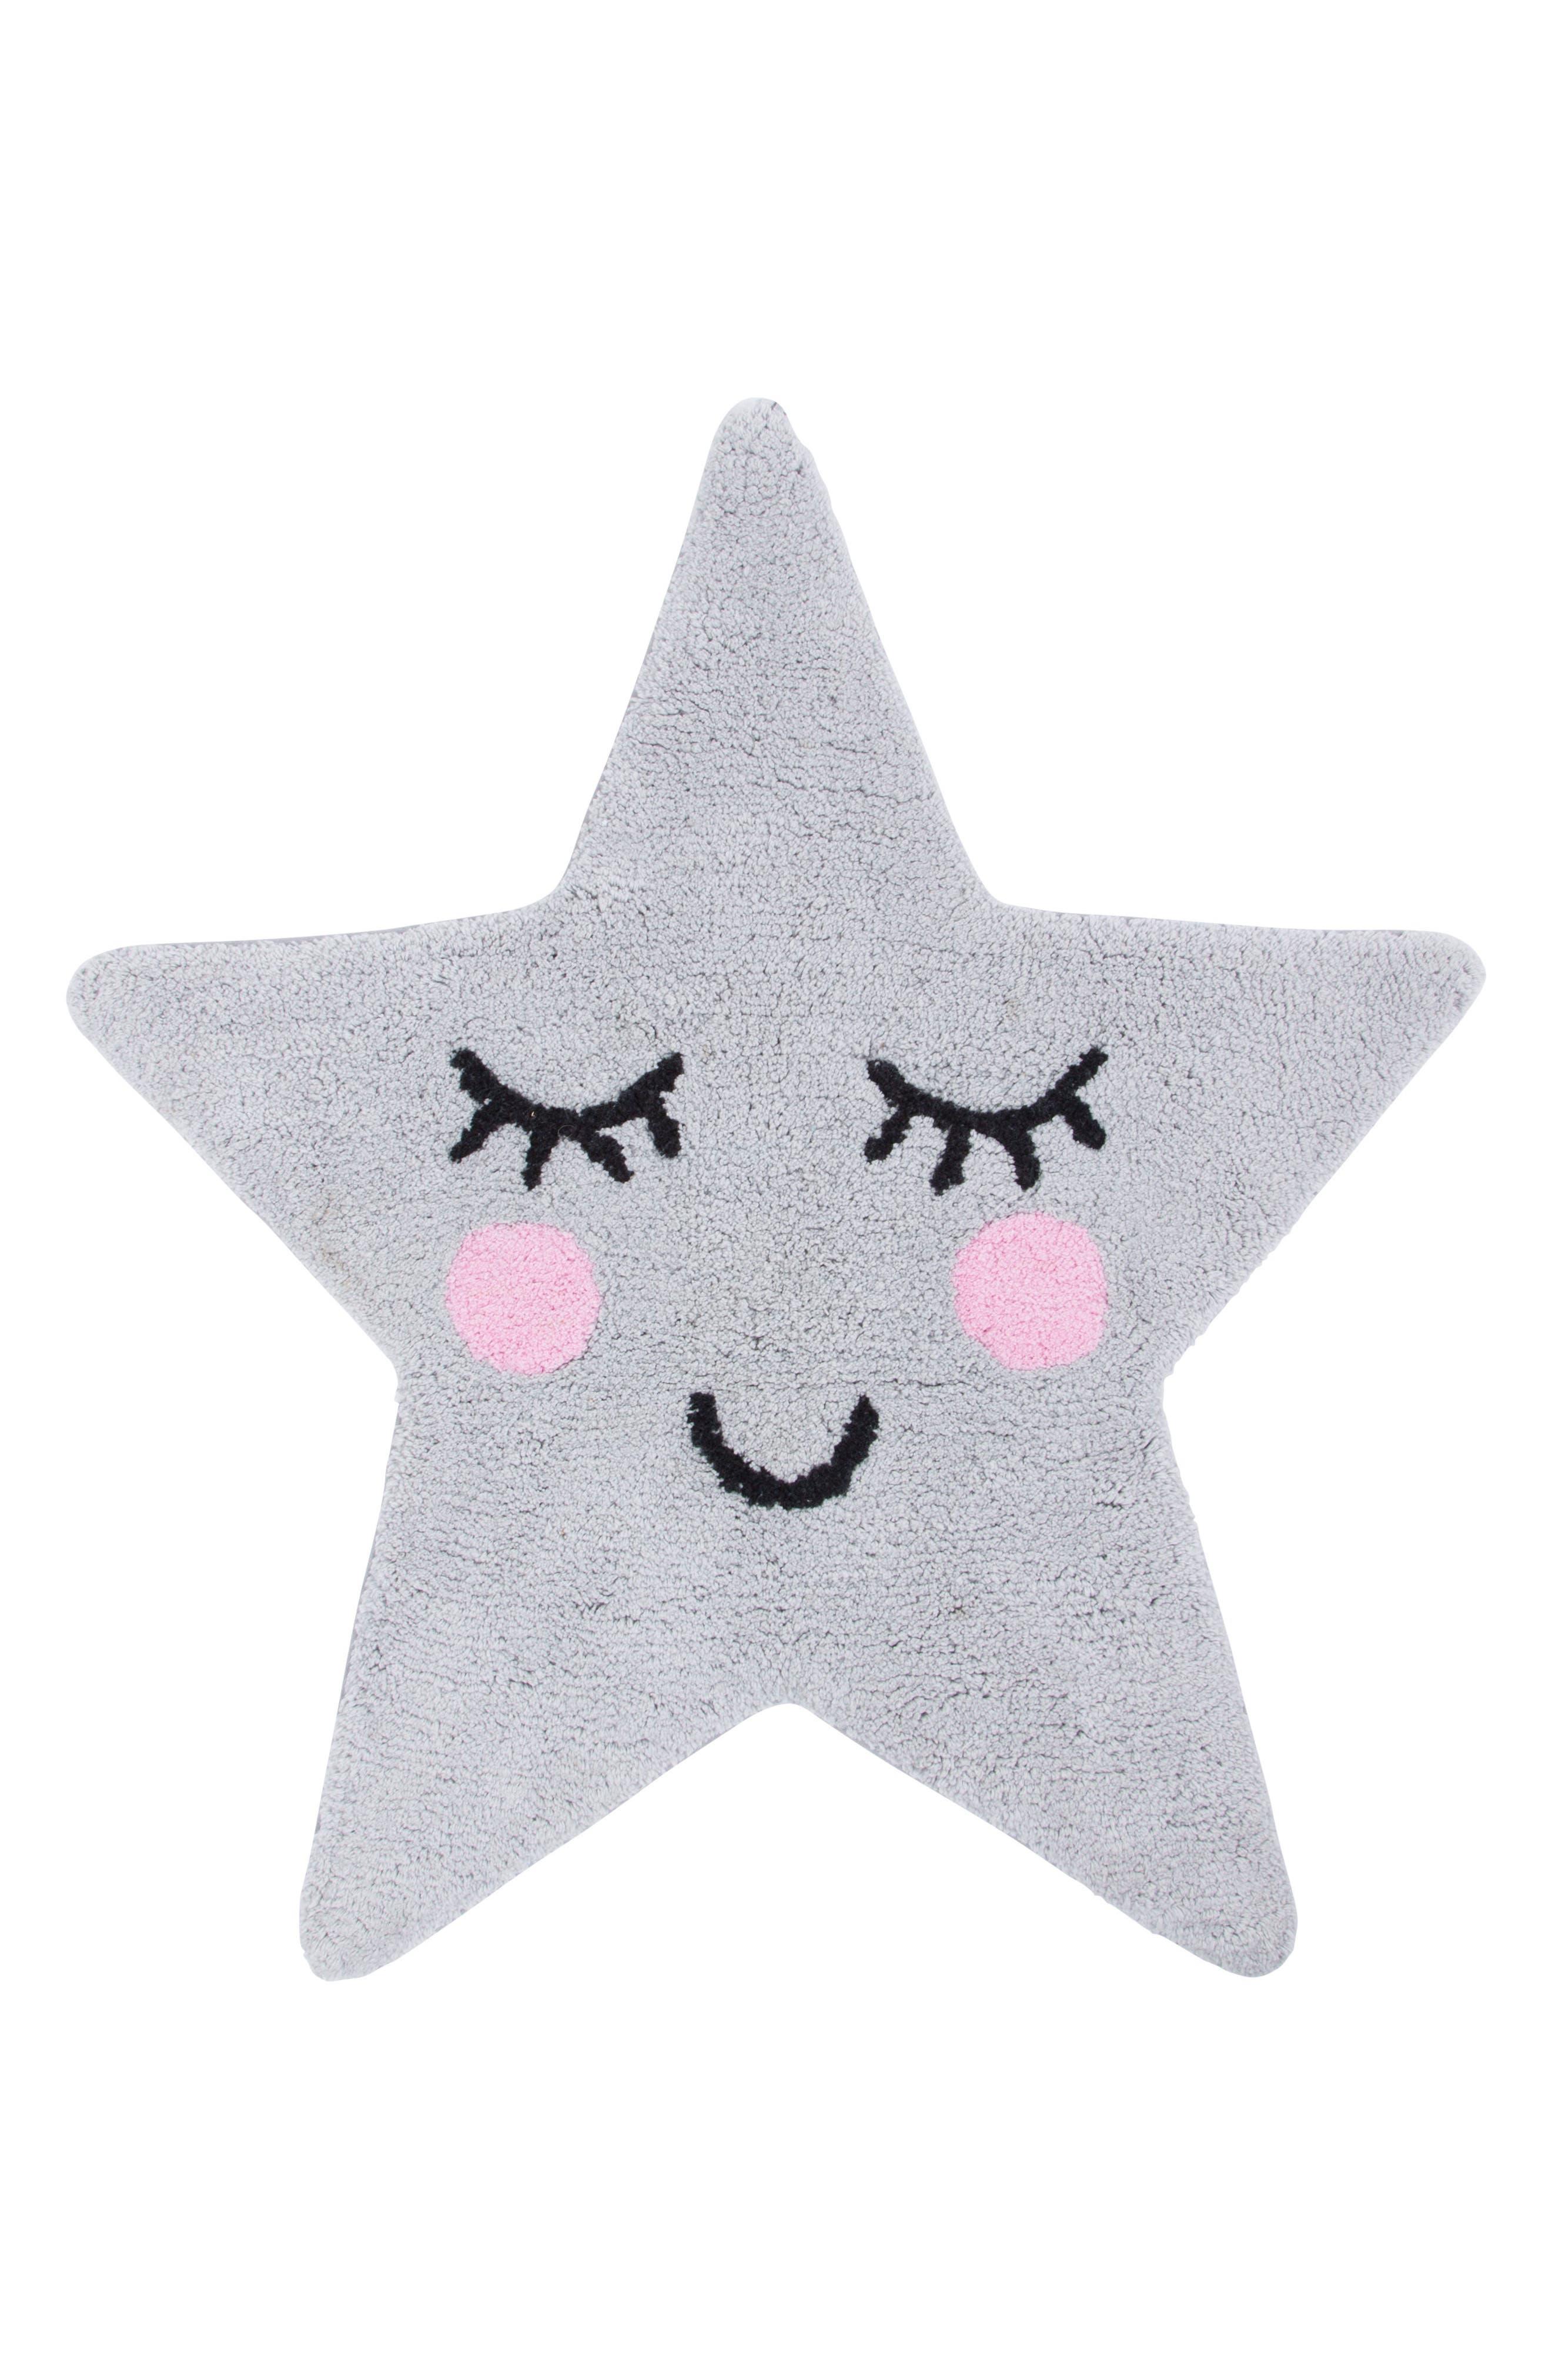 SASS & BELLE, Sweet Dreams Star Rug, Main thumbnail 1, color, 020